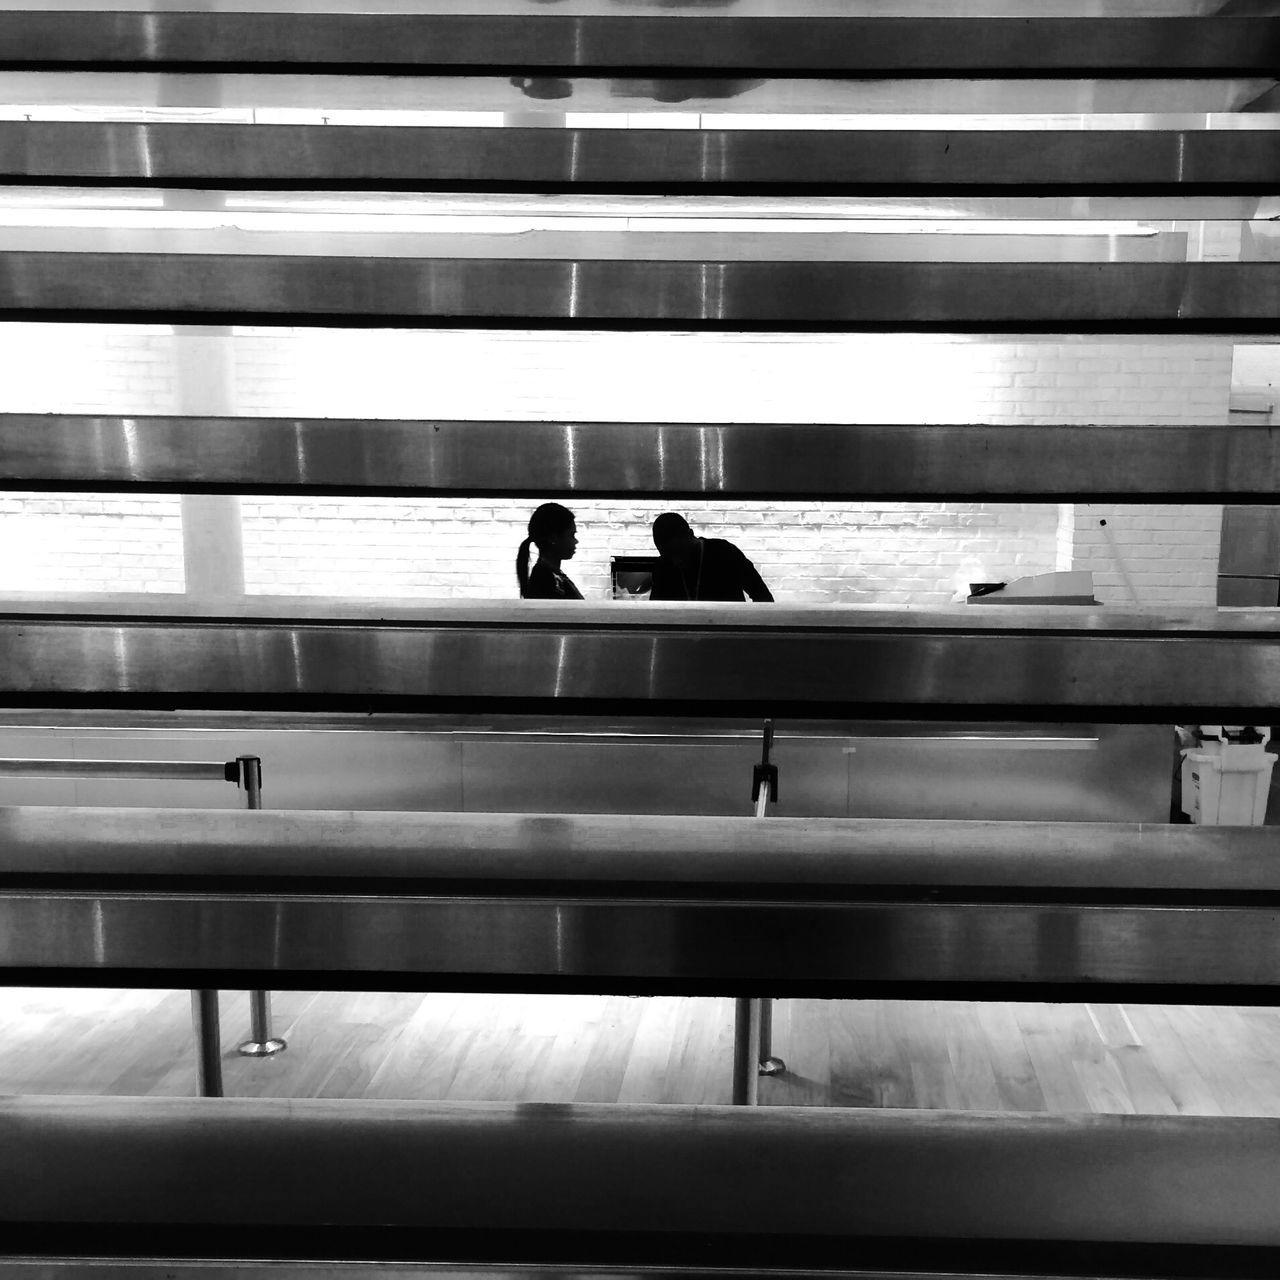 Woman Blackandwhite Stairs People The Street Photographer - 2015 EyeEm Awards Stairways